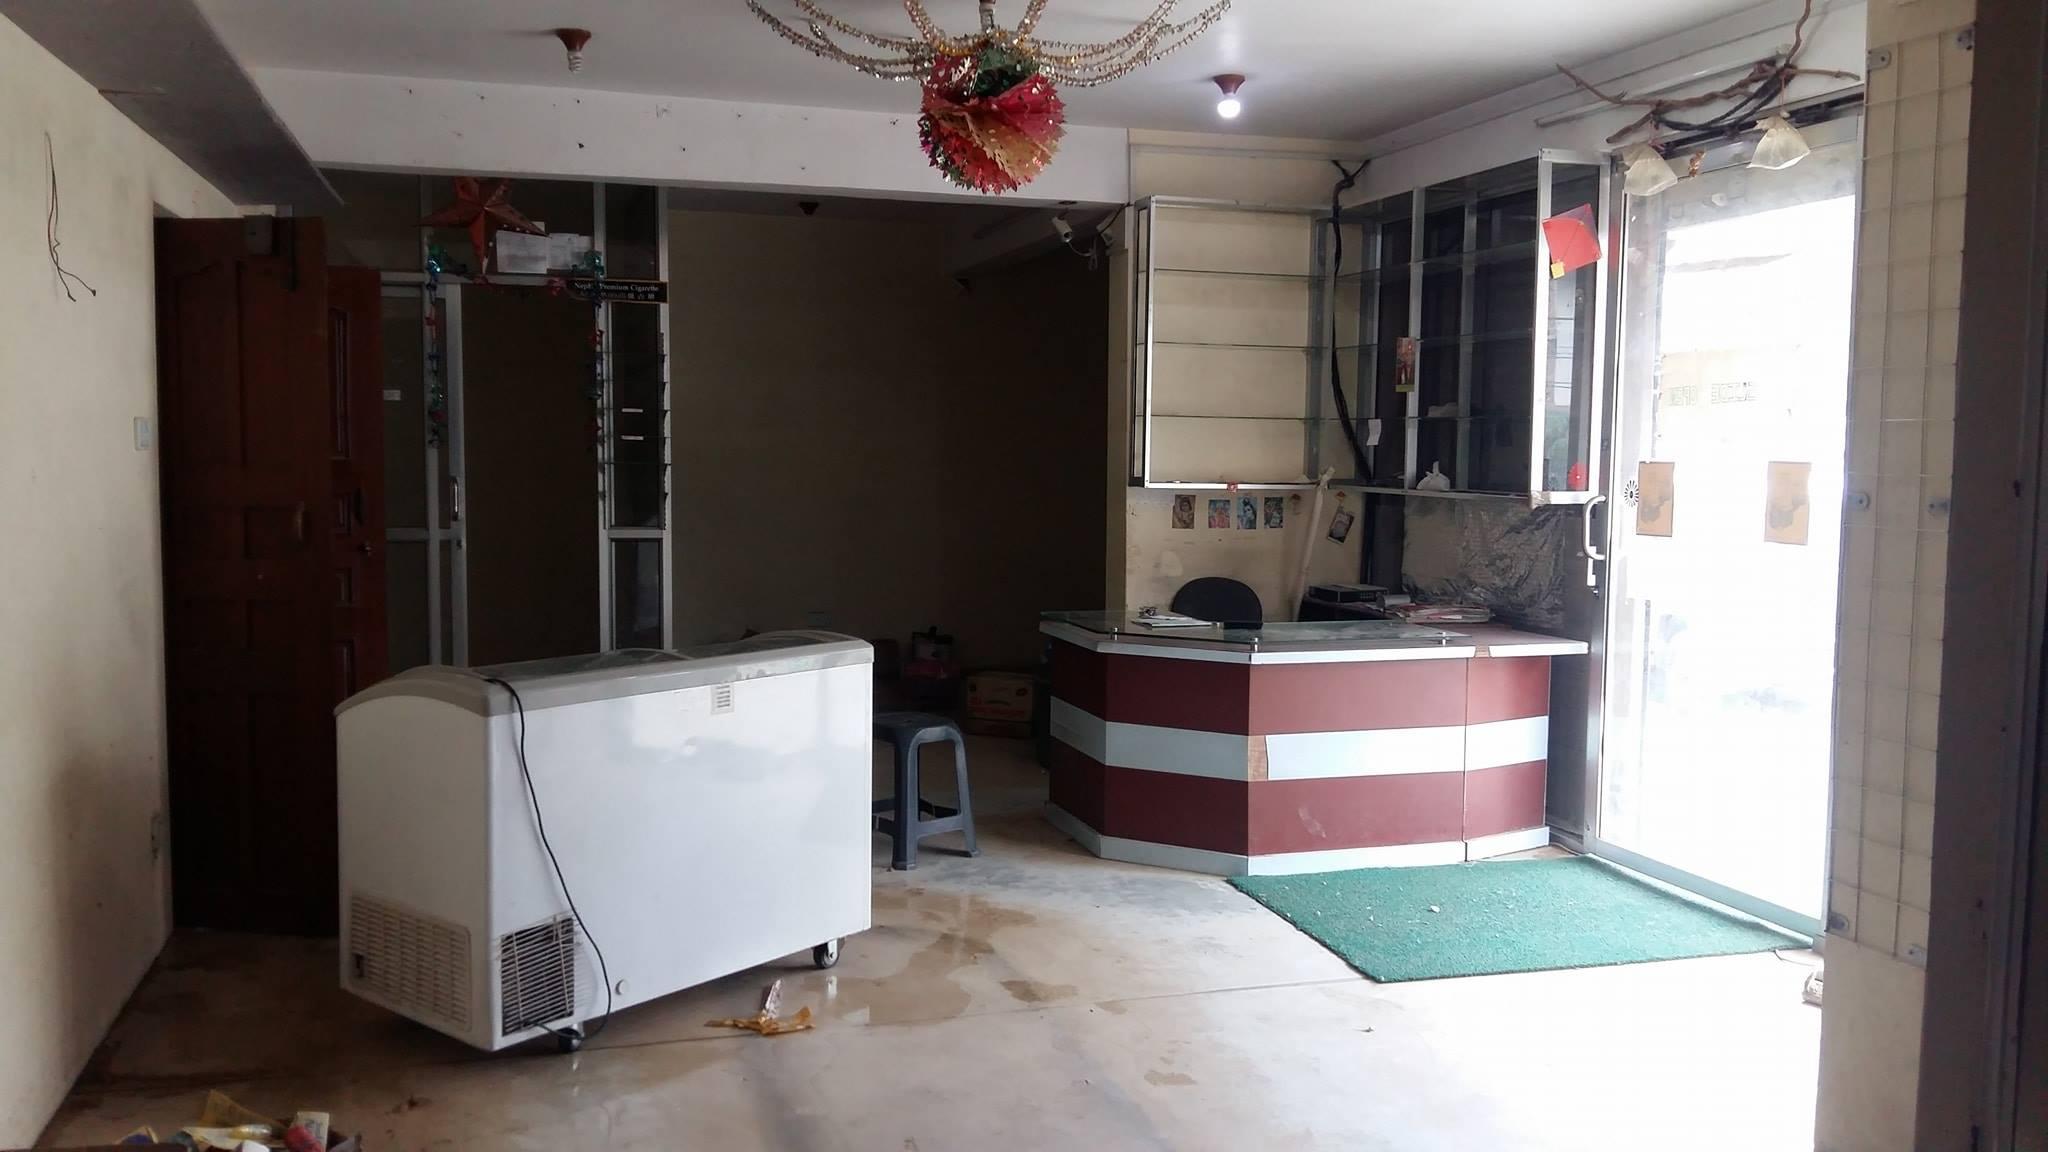 Departmental Store Racks In Nepal Loja De Departamento